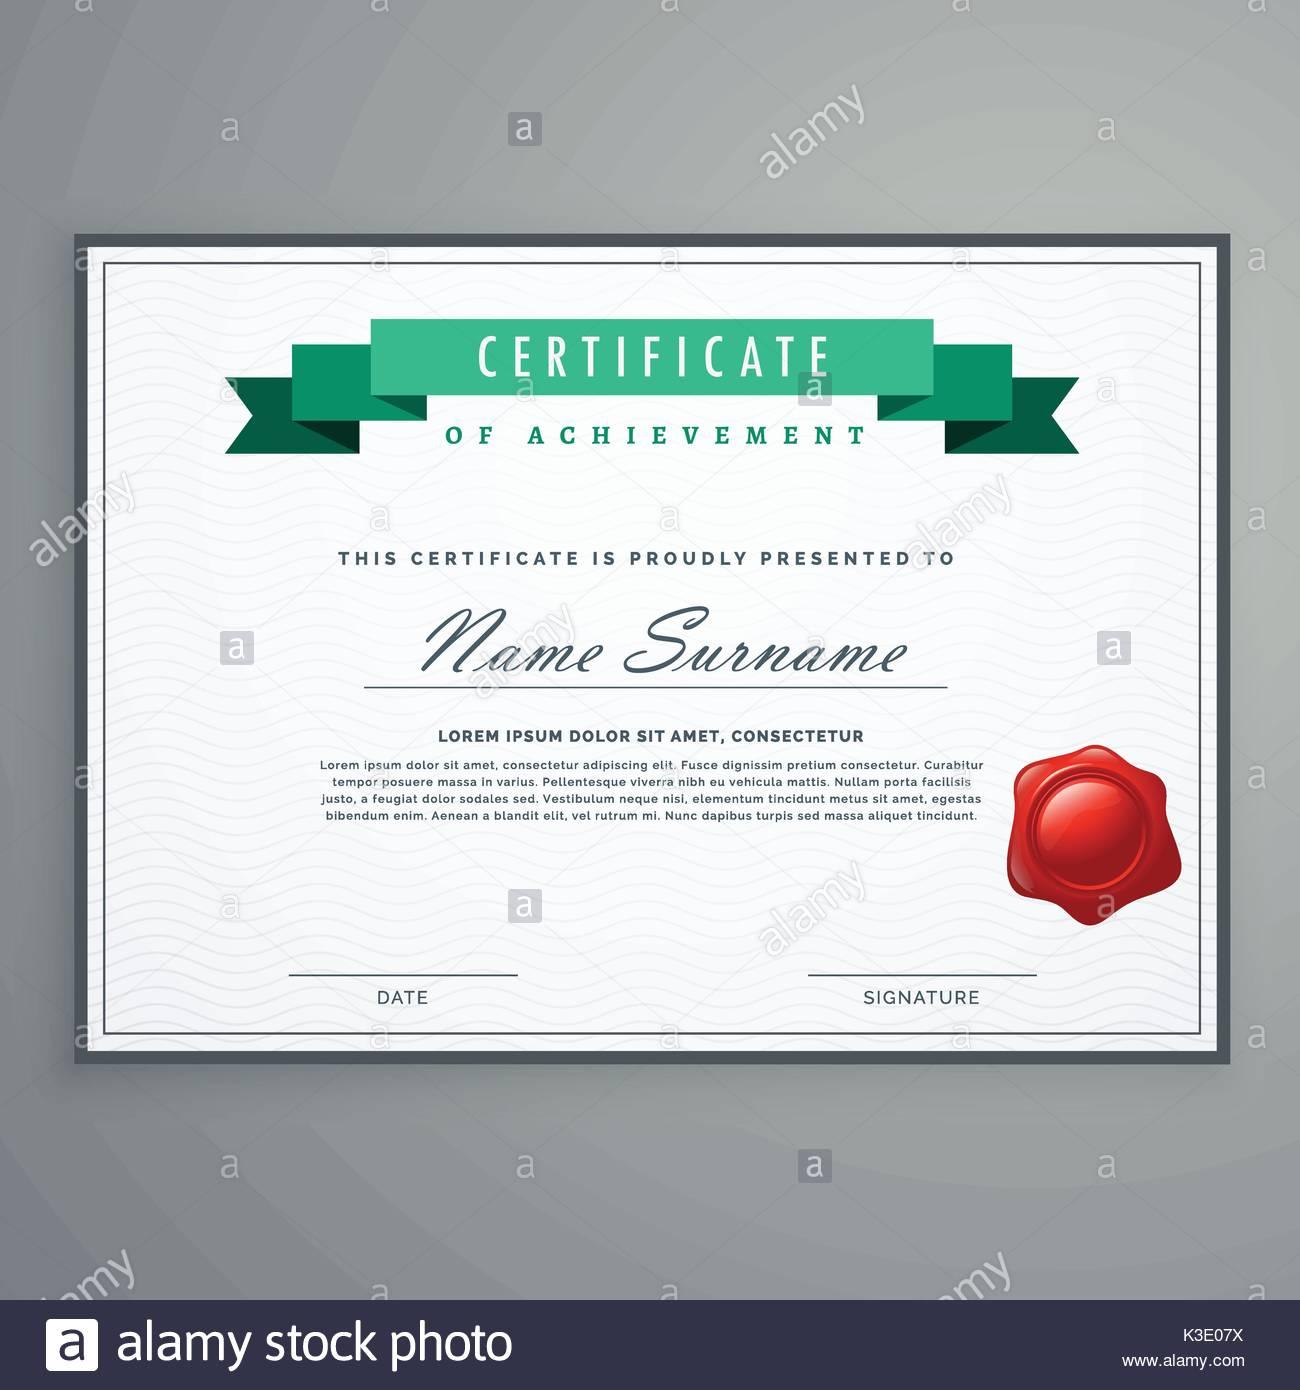 Sauber Zertifikat Design Template award Diplom Hintergrund Vektor ...